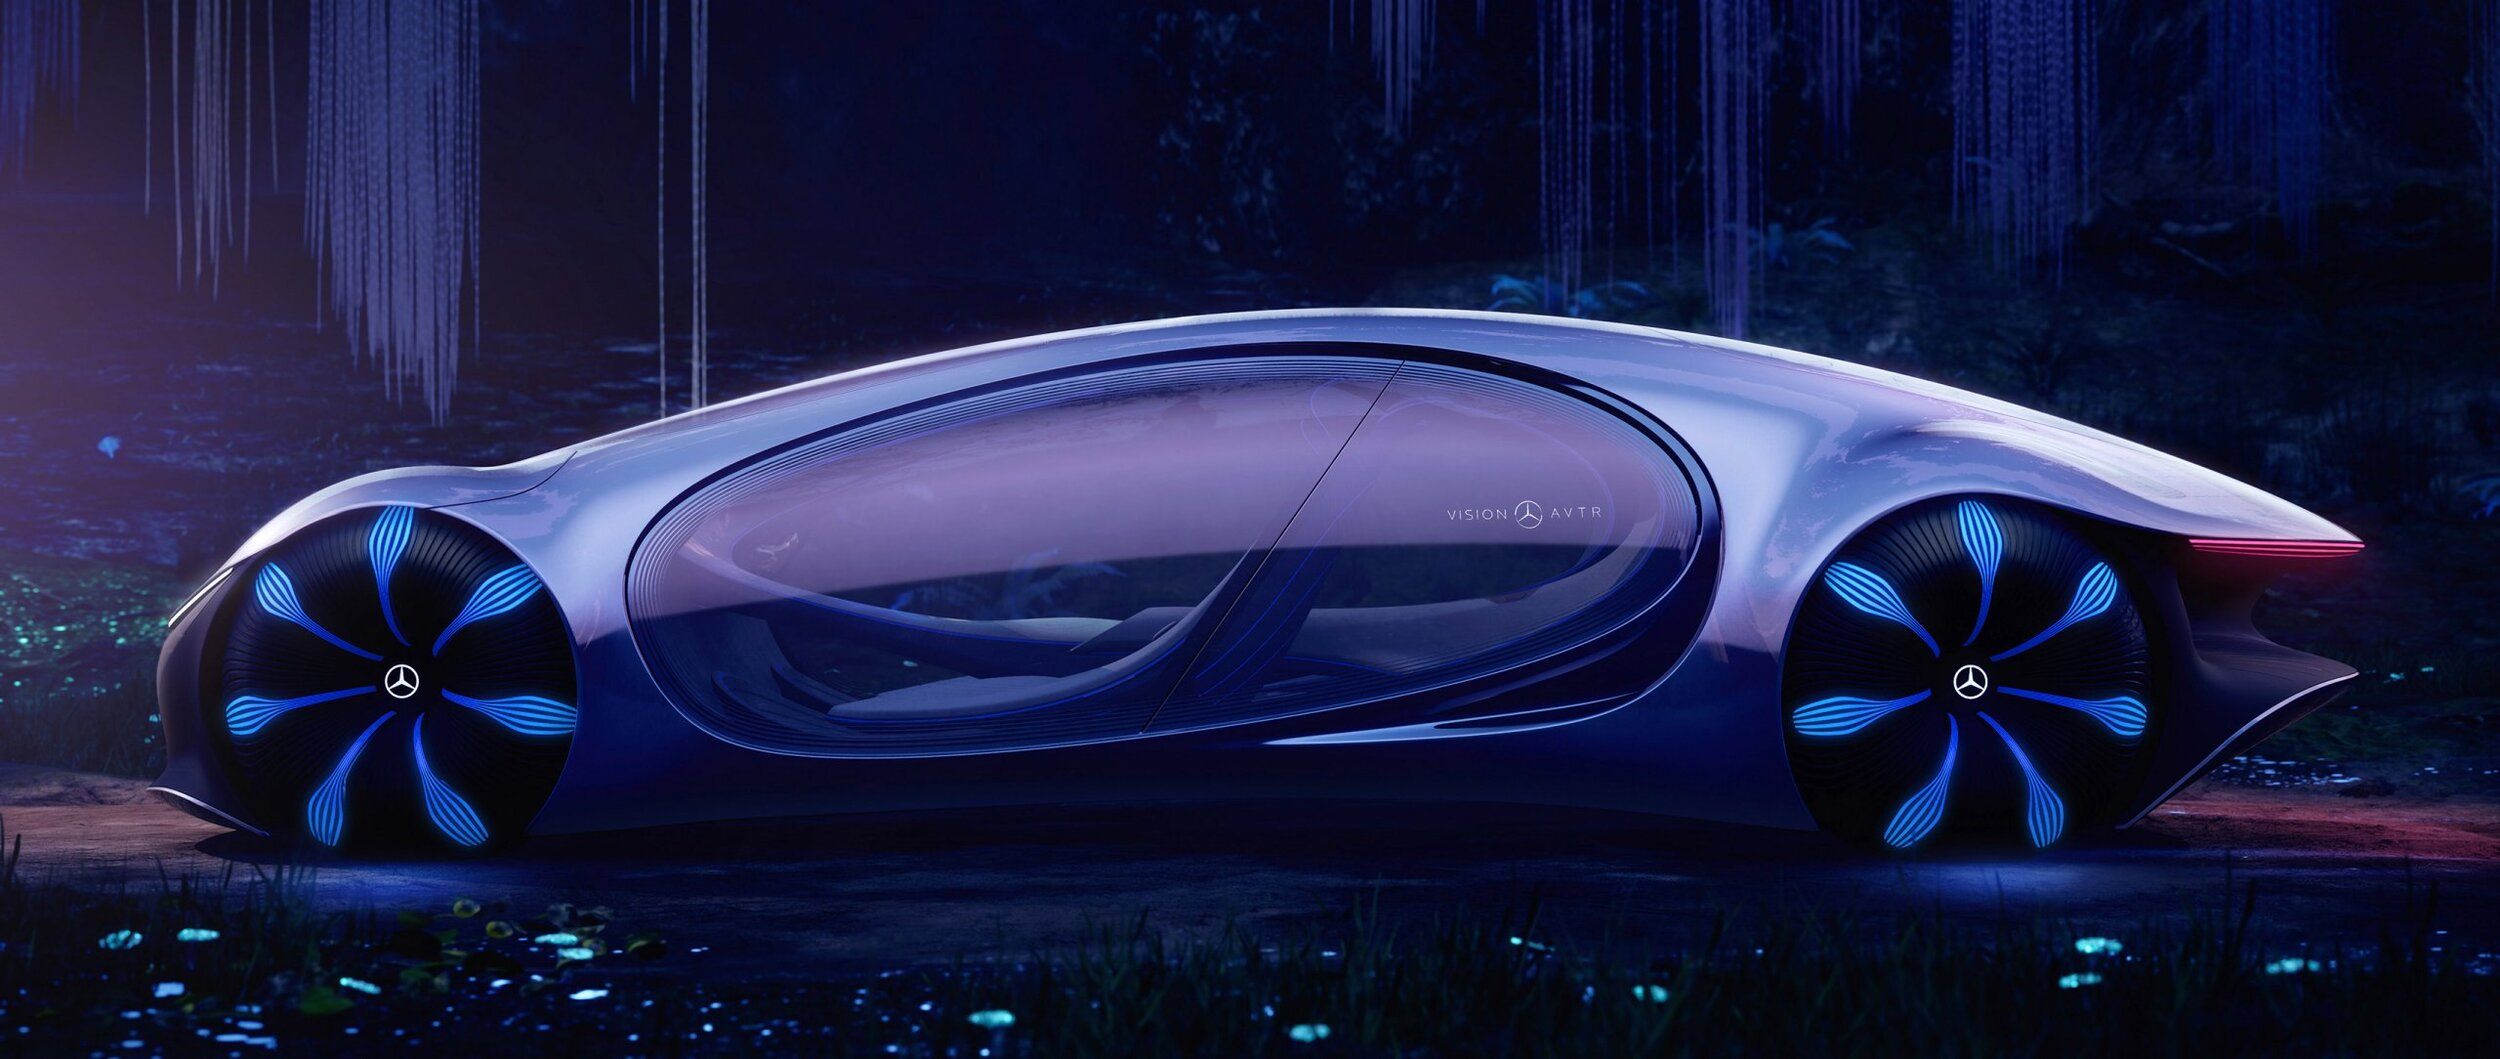 13-mercedes-benz-vehicles-concept-cars-vision-avtr-3400x1440.jpeg